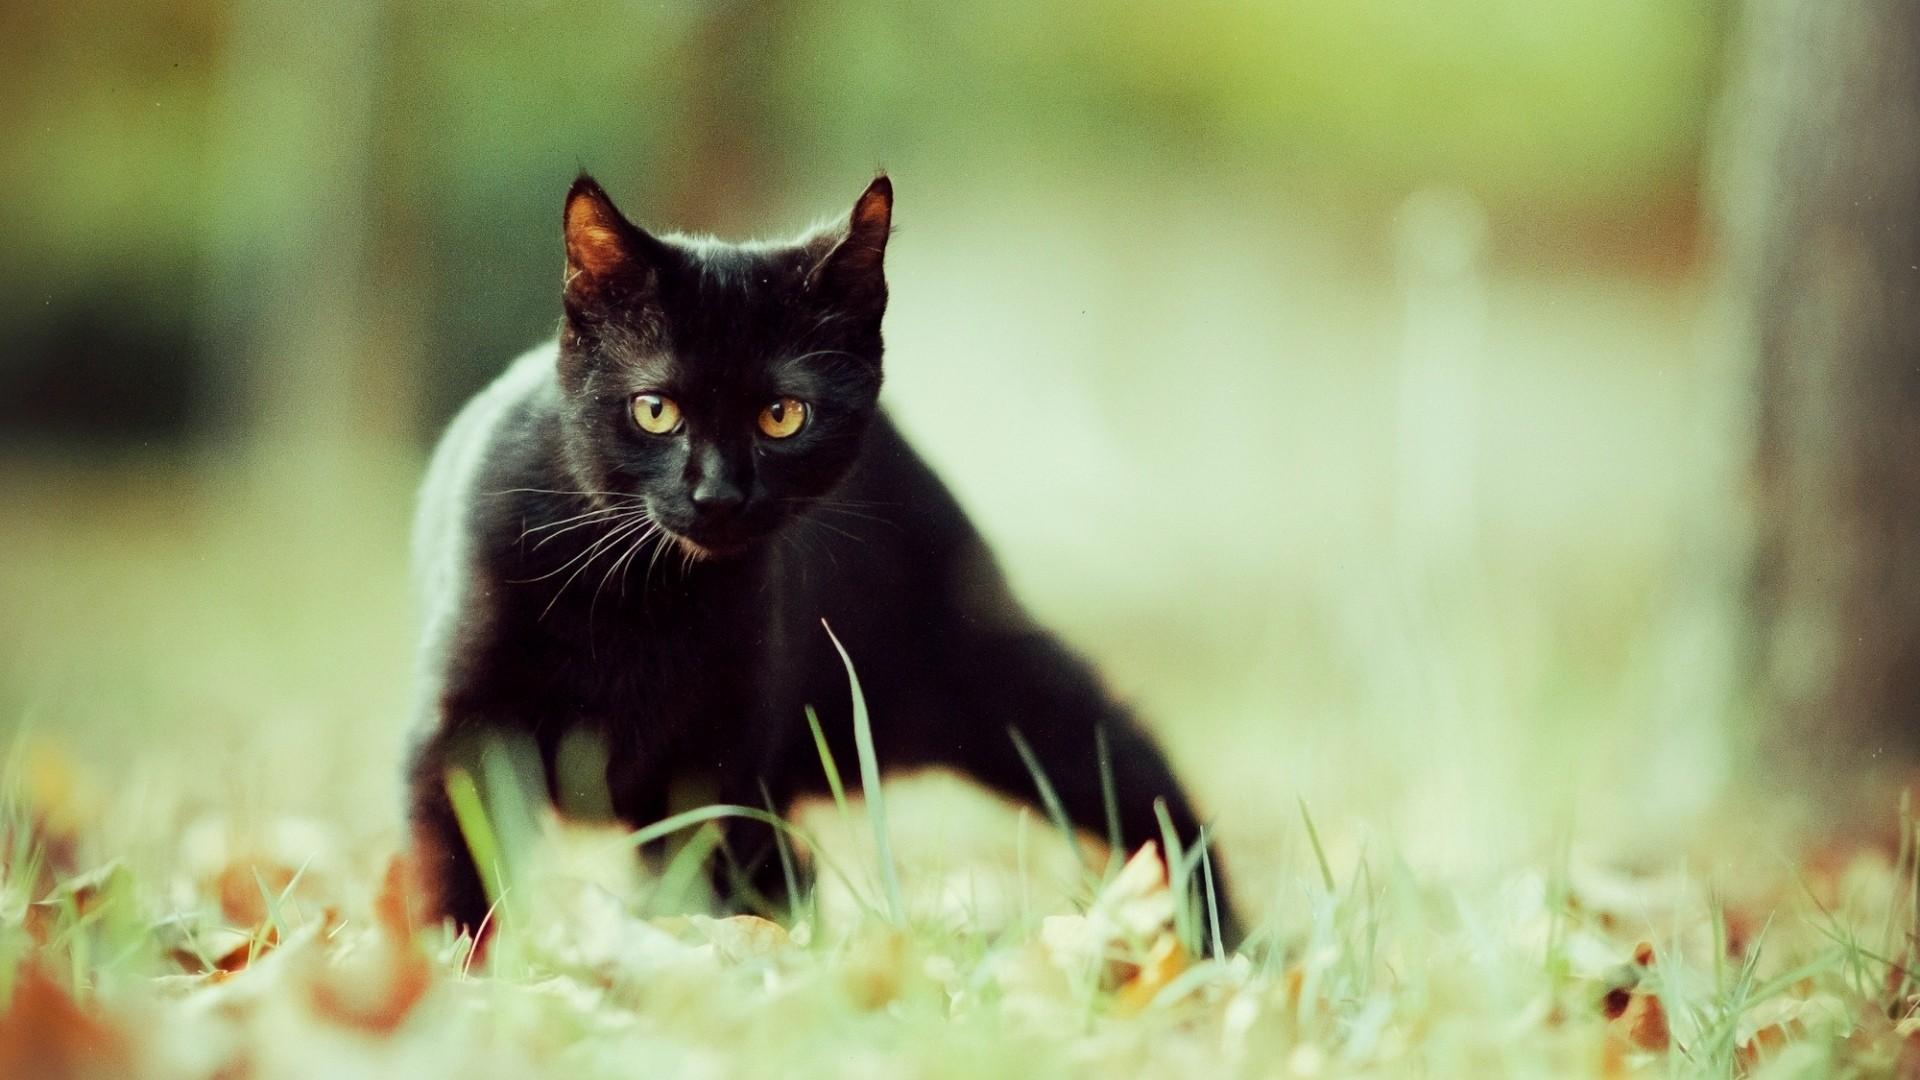 Black Cat hd desktop